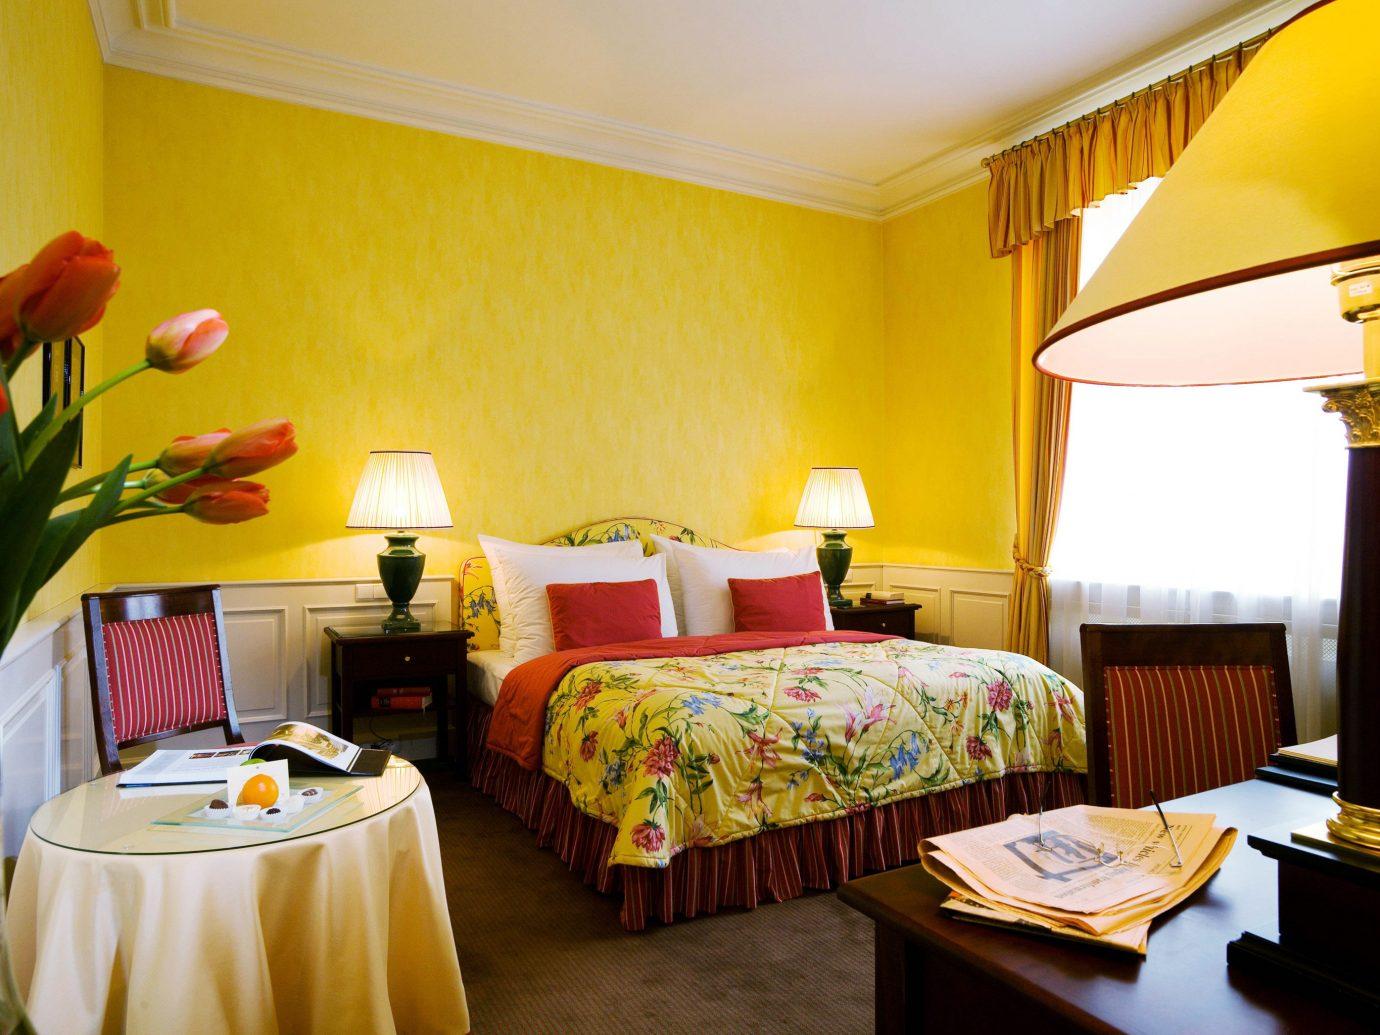 Bedroom City Classic Elegant europe Historic Hotels Prague wall indoor room Suite yellow Resort ceiling estate cottage interior design real estate Villa bright furniture